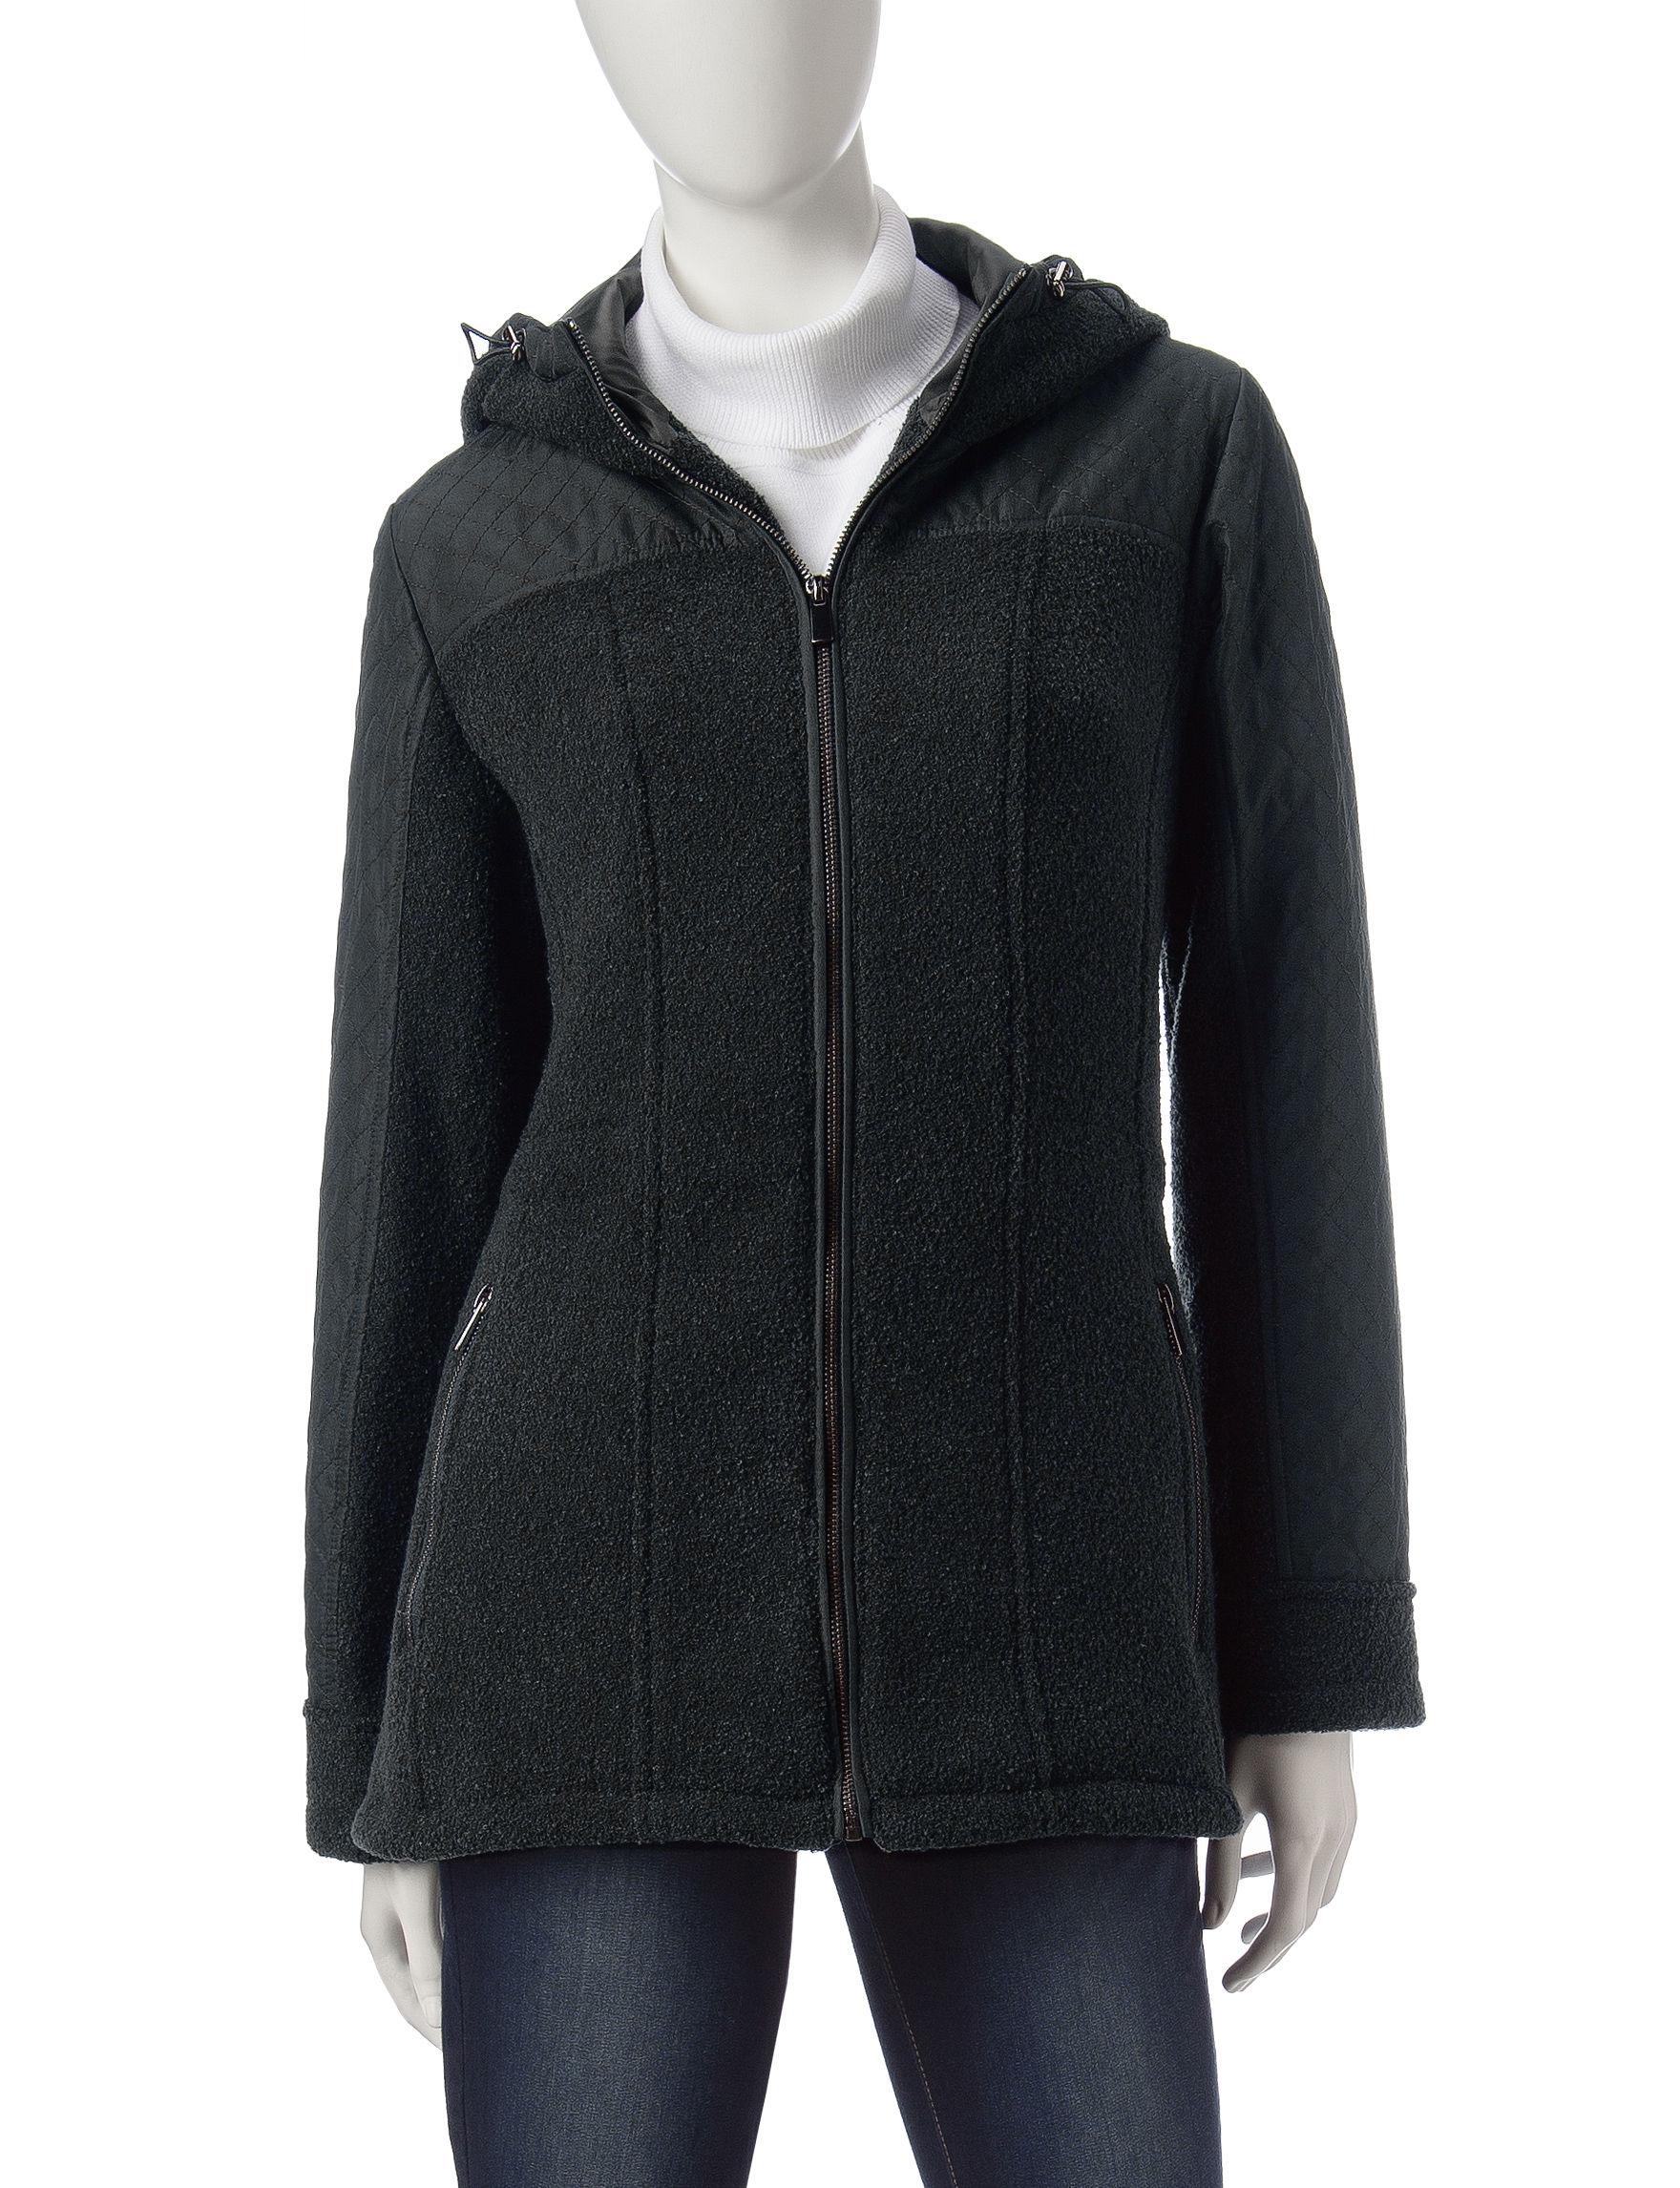 Valerie Stevens Black Puffer & Quilted Jackets